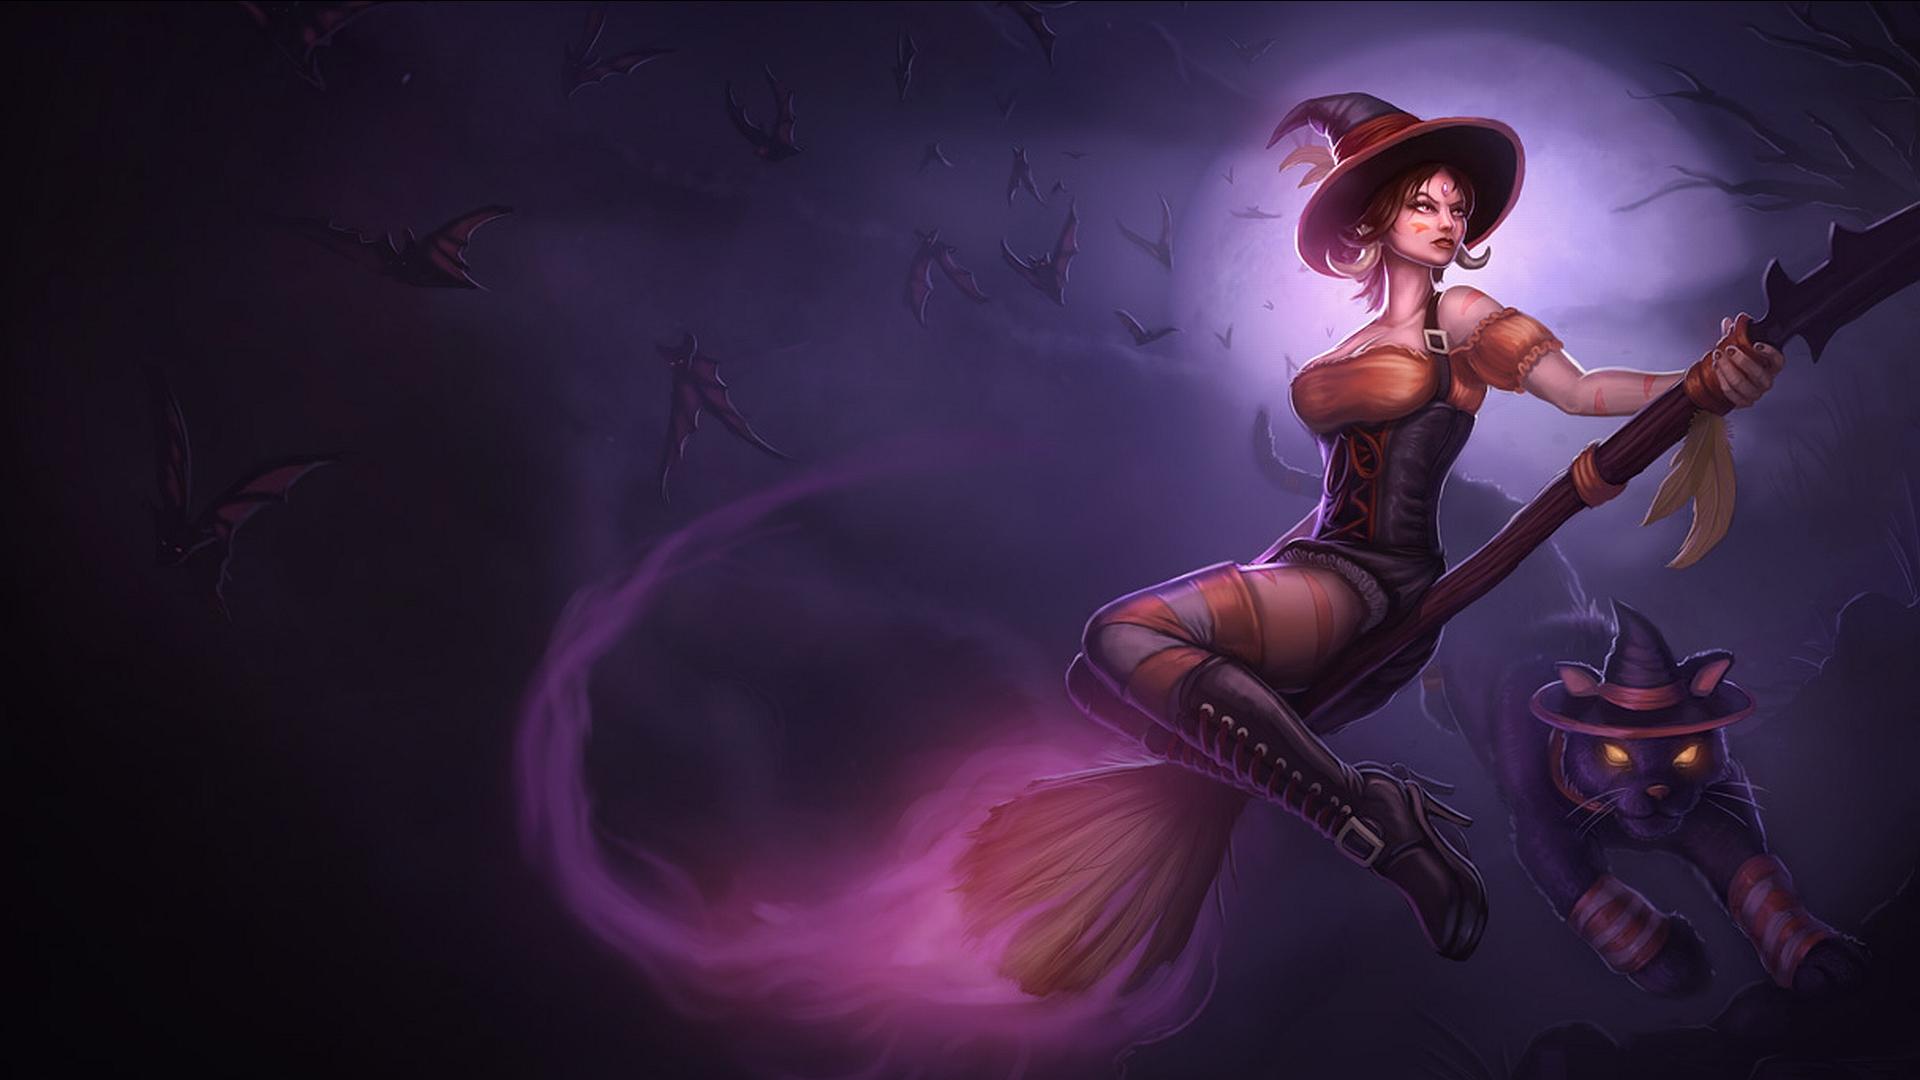 league of legends fantasy art dark horror witch wallpaper